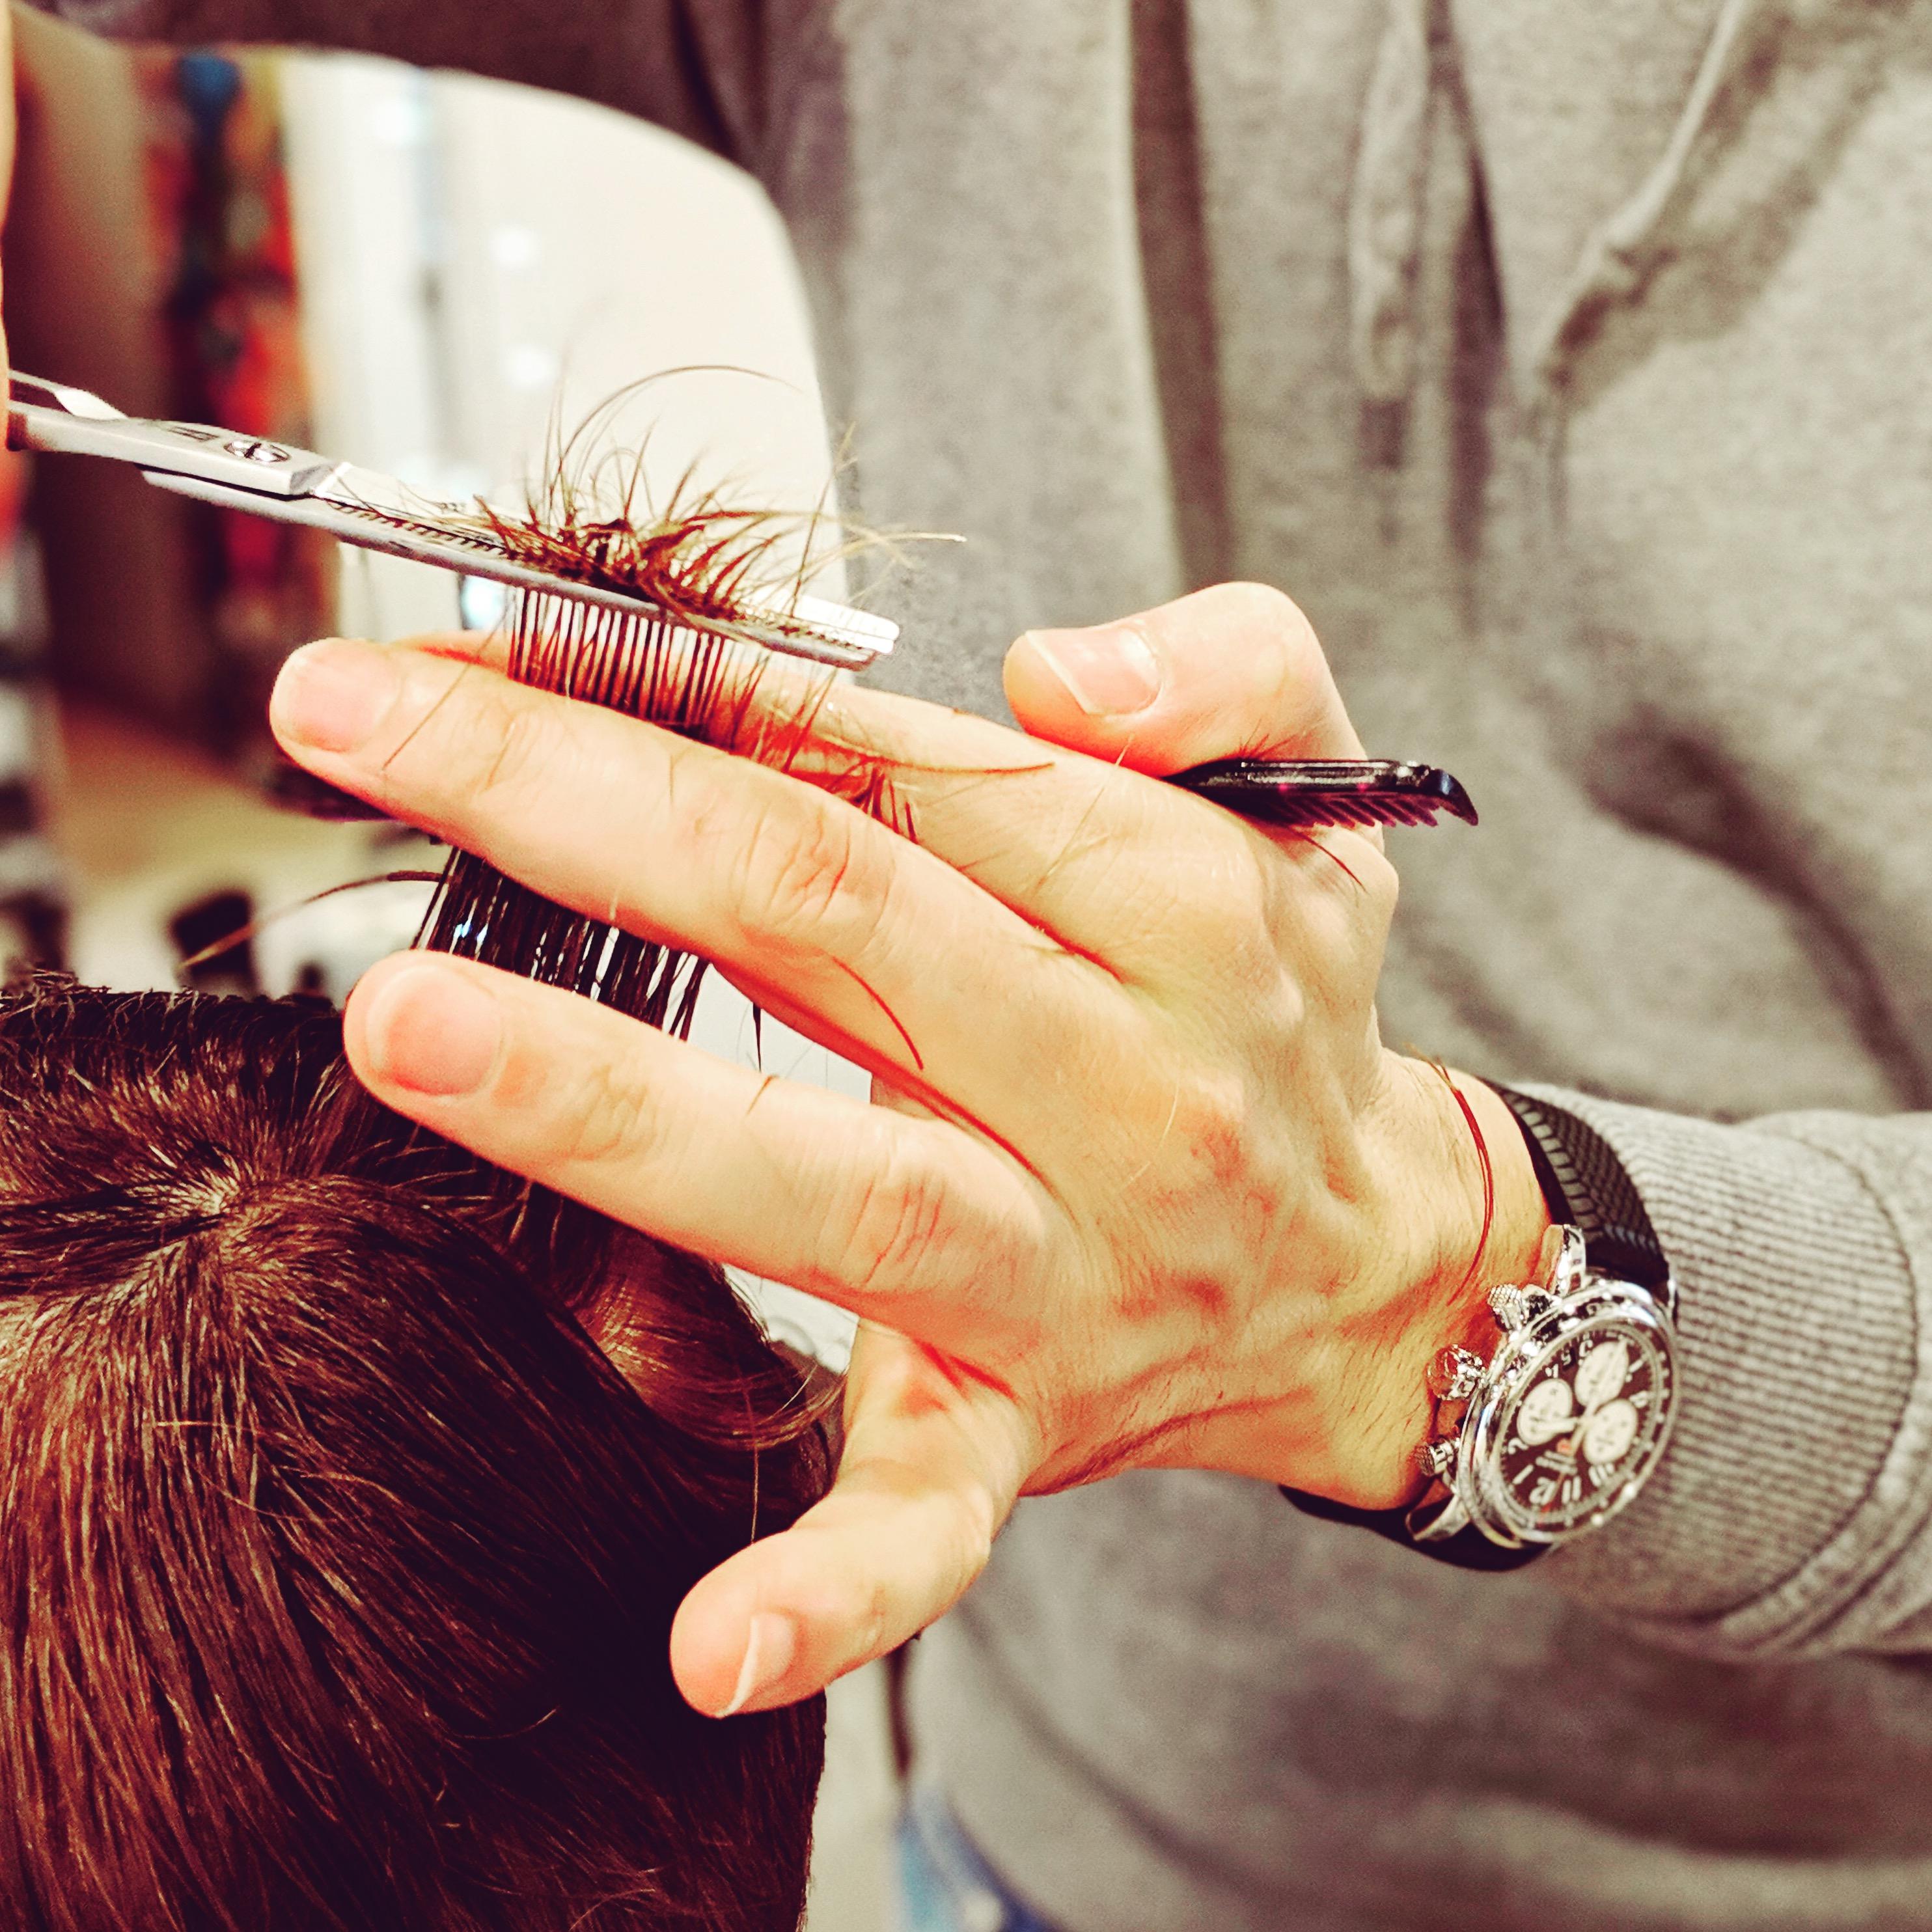 Salon de coiffure mixte à Marseille